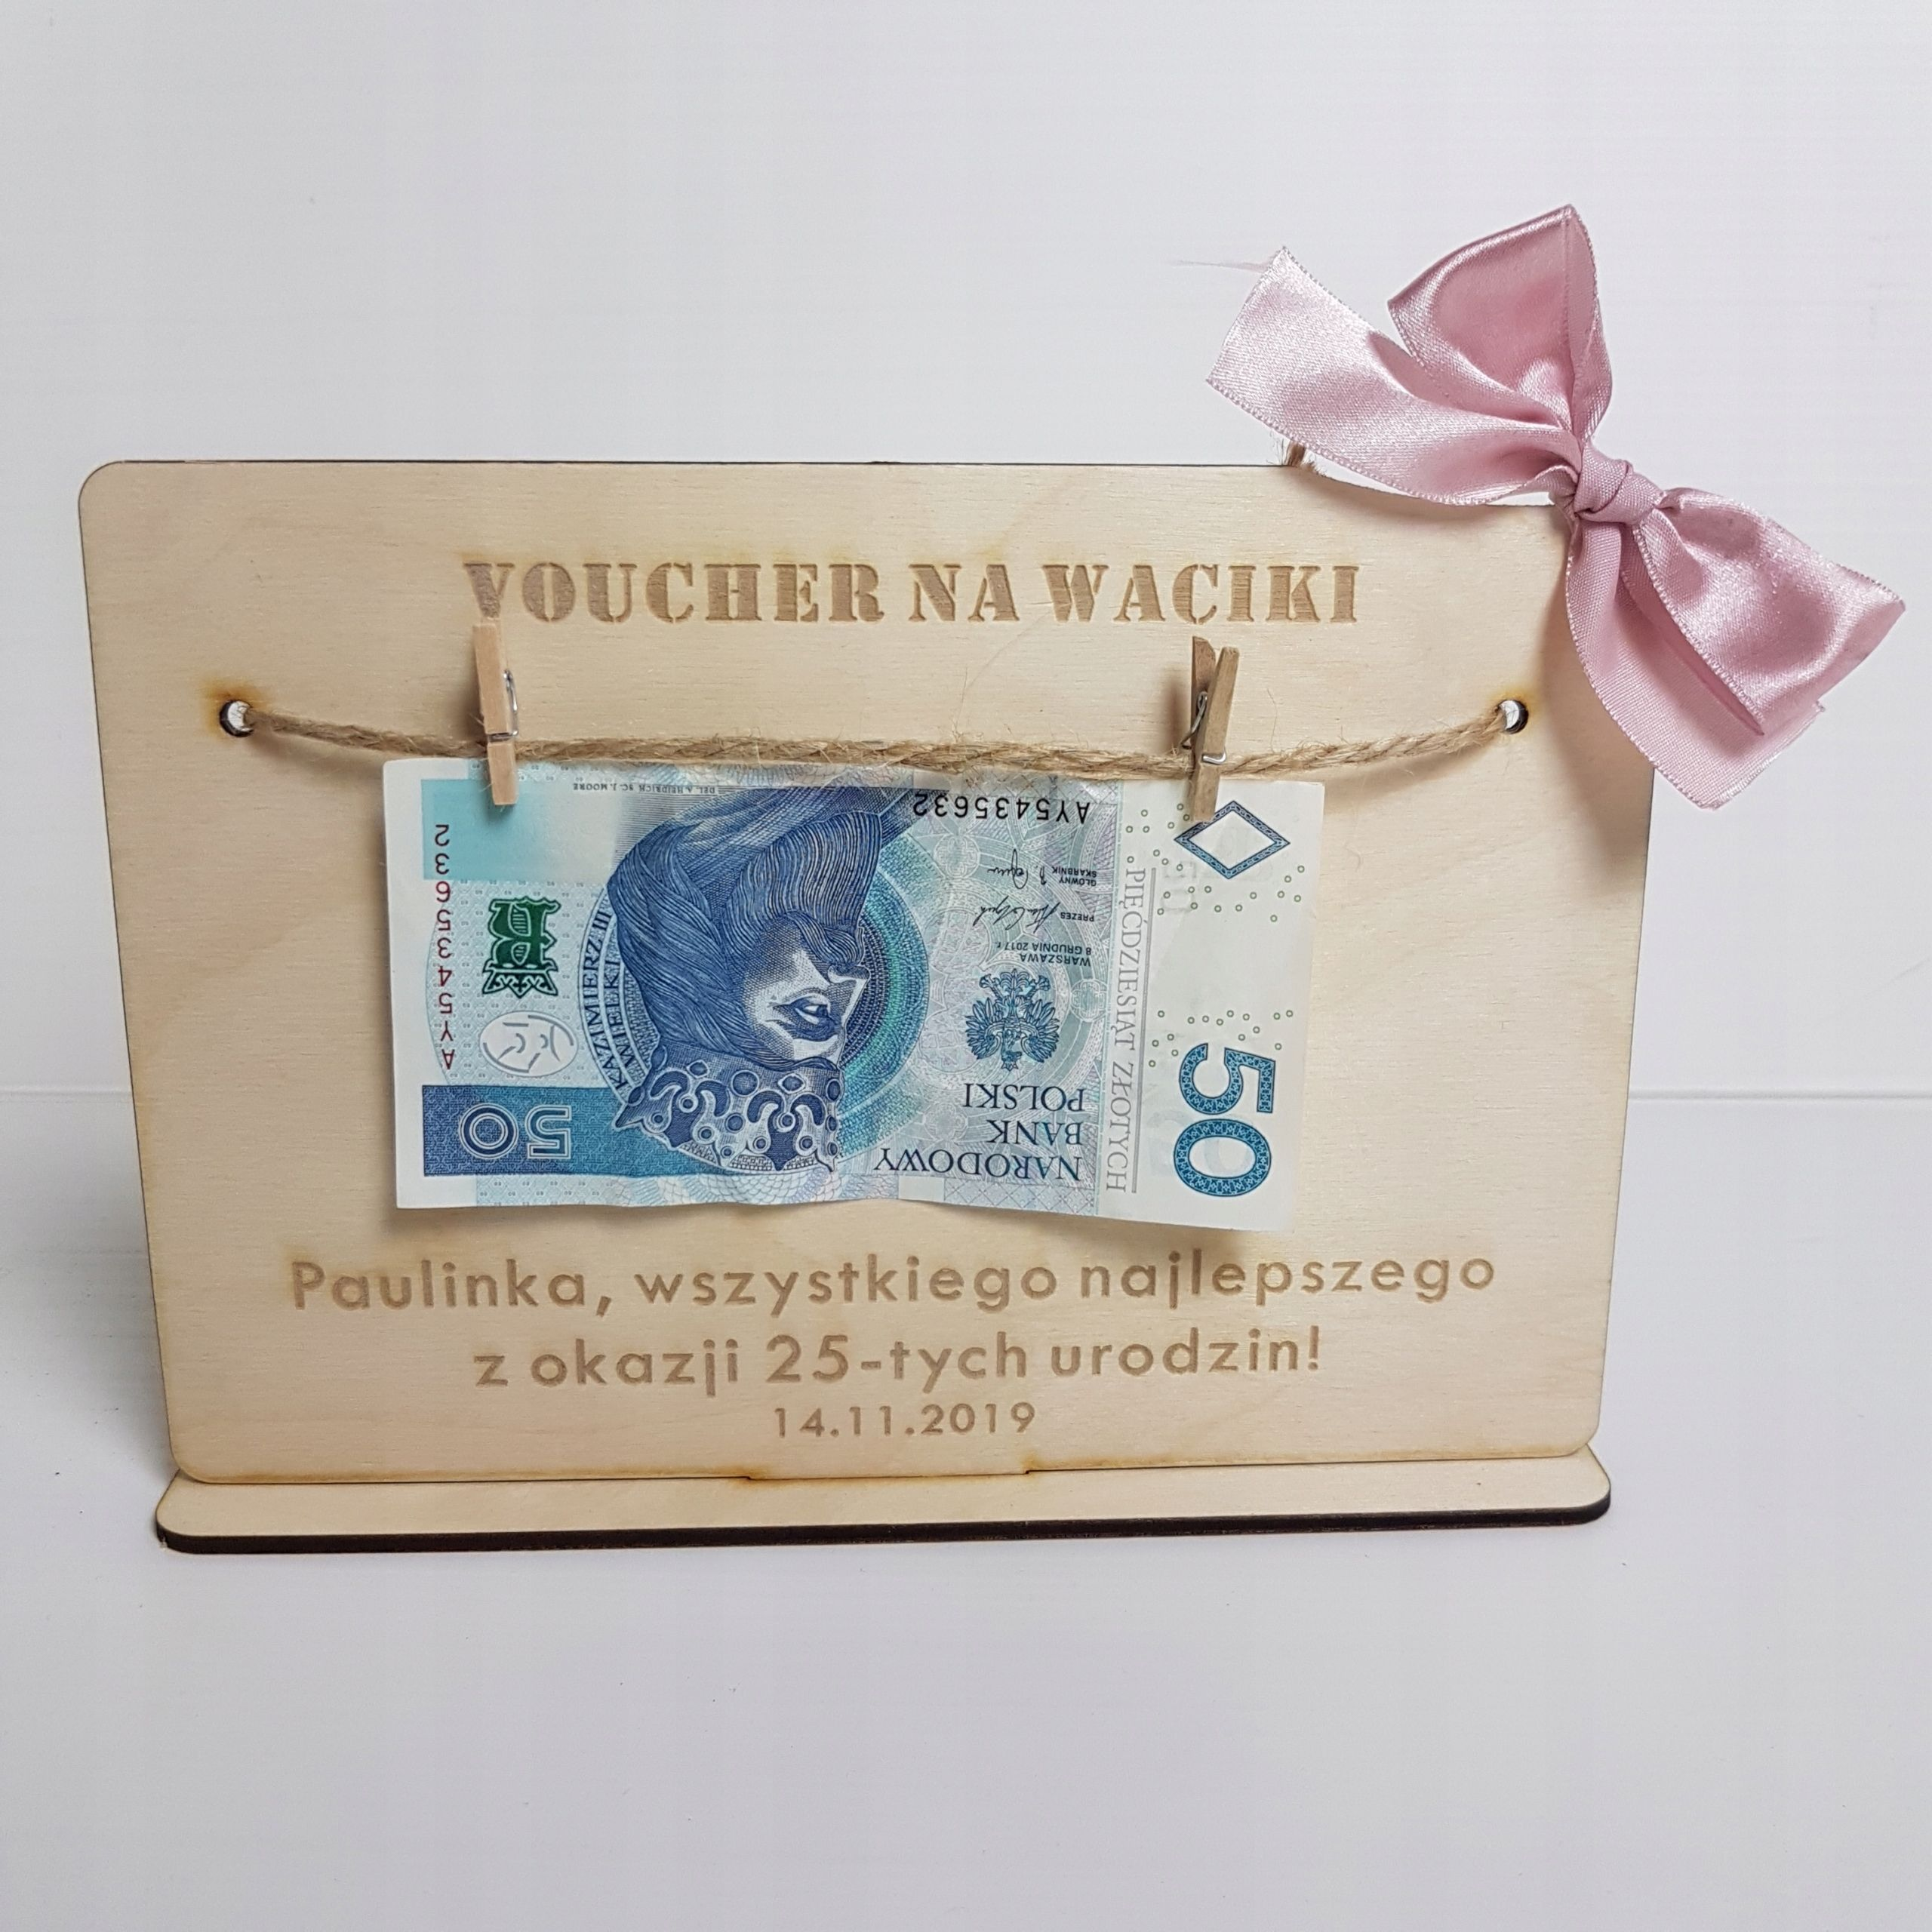 Voucher Na Waciki Prezent Na Urodziny Mikolaja Diy Gifts Gifts Diy And Crafts